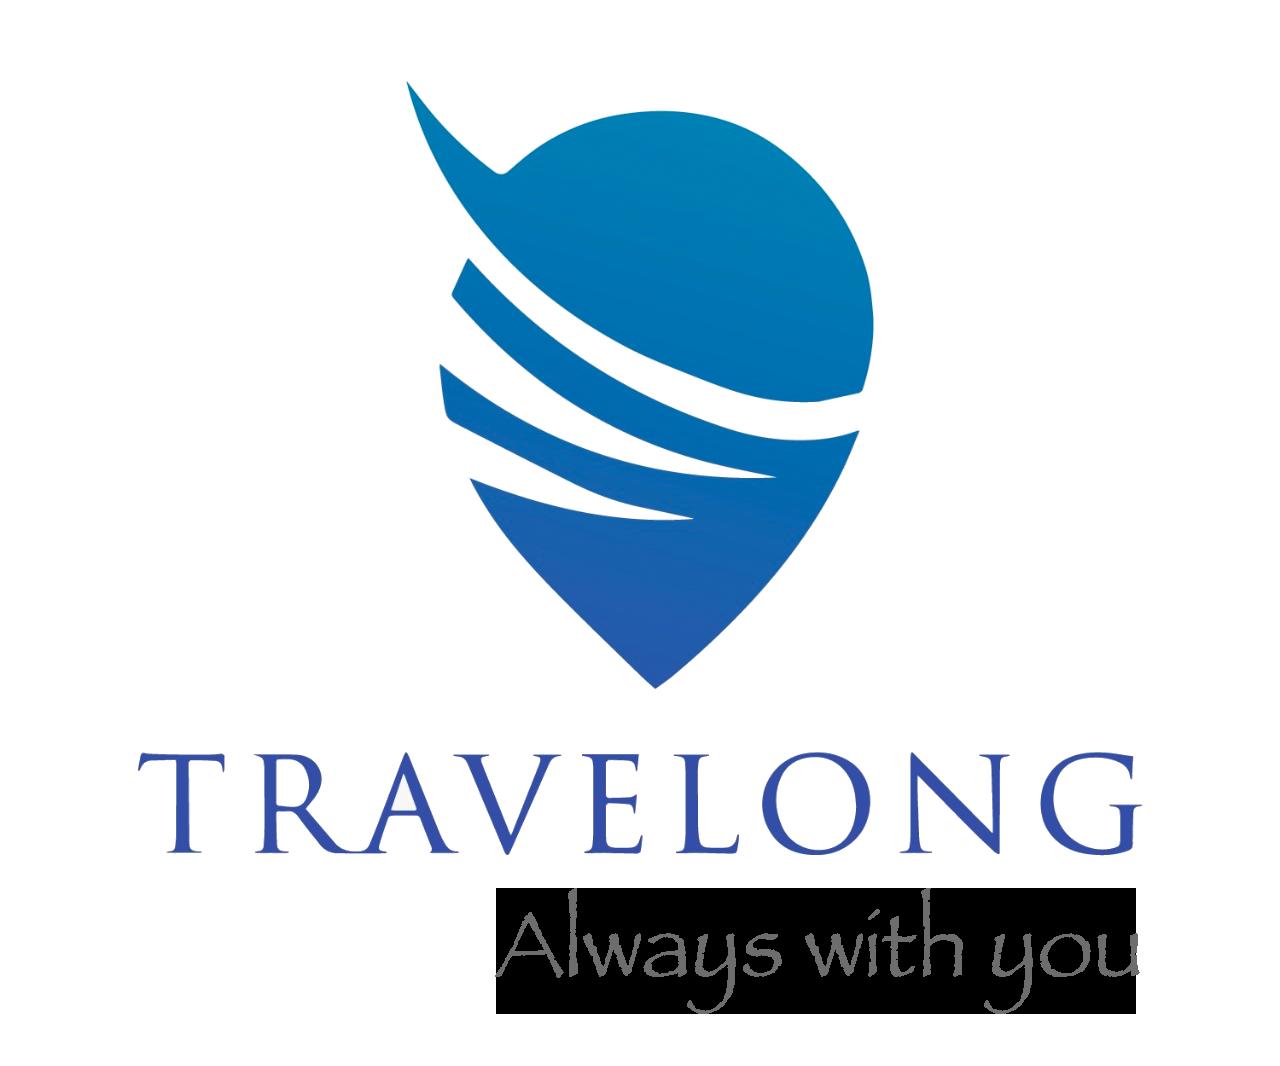 Travelong